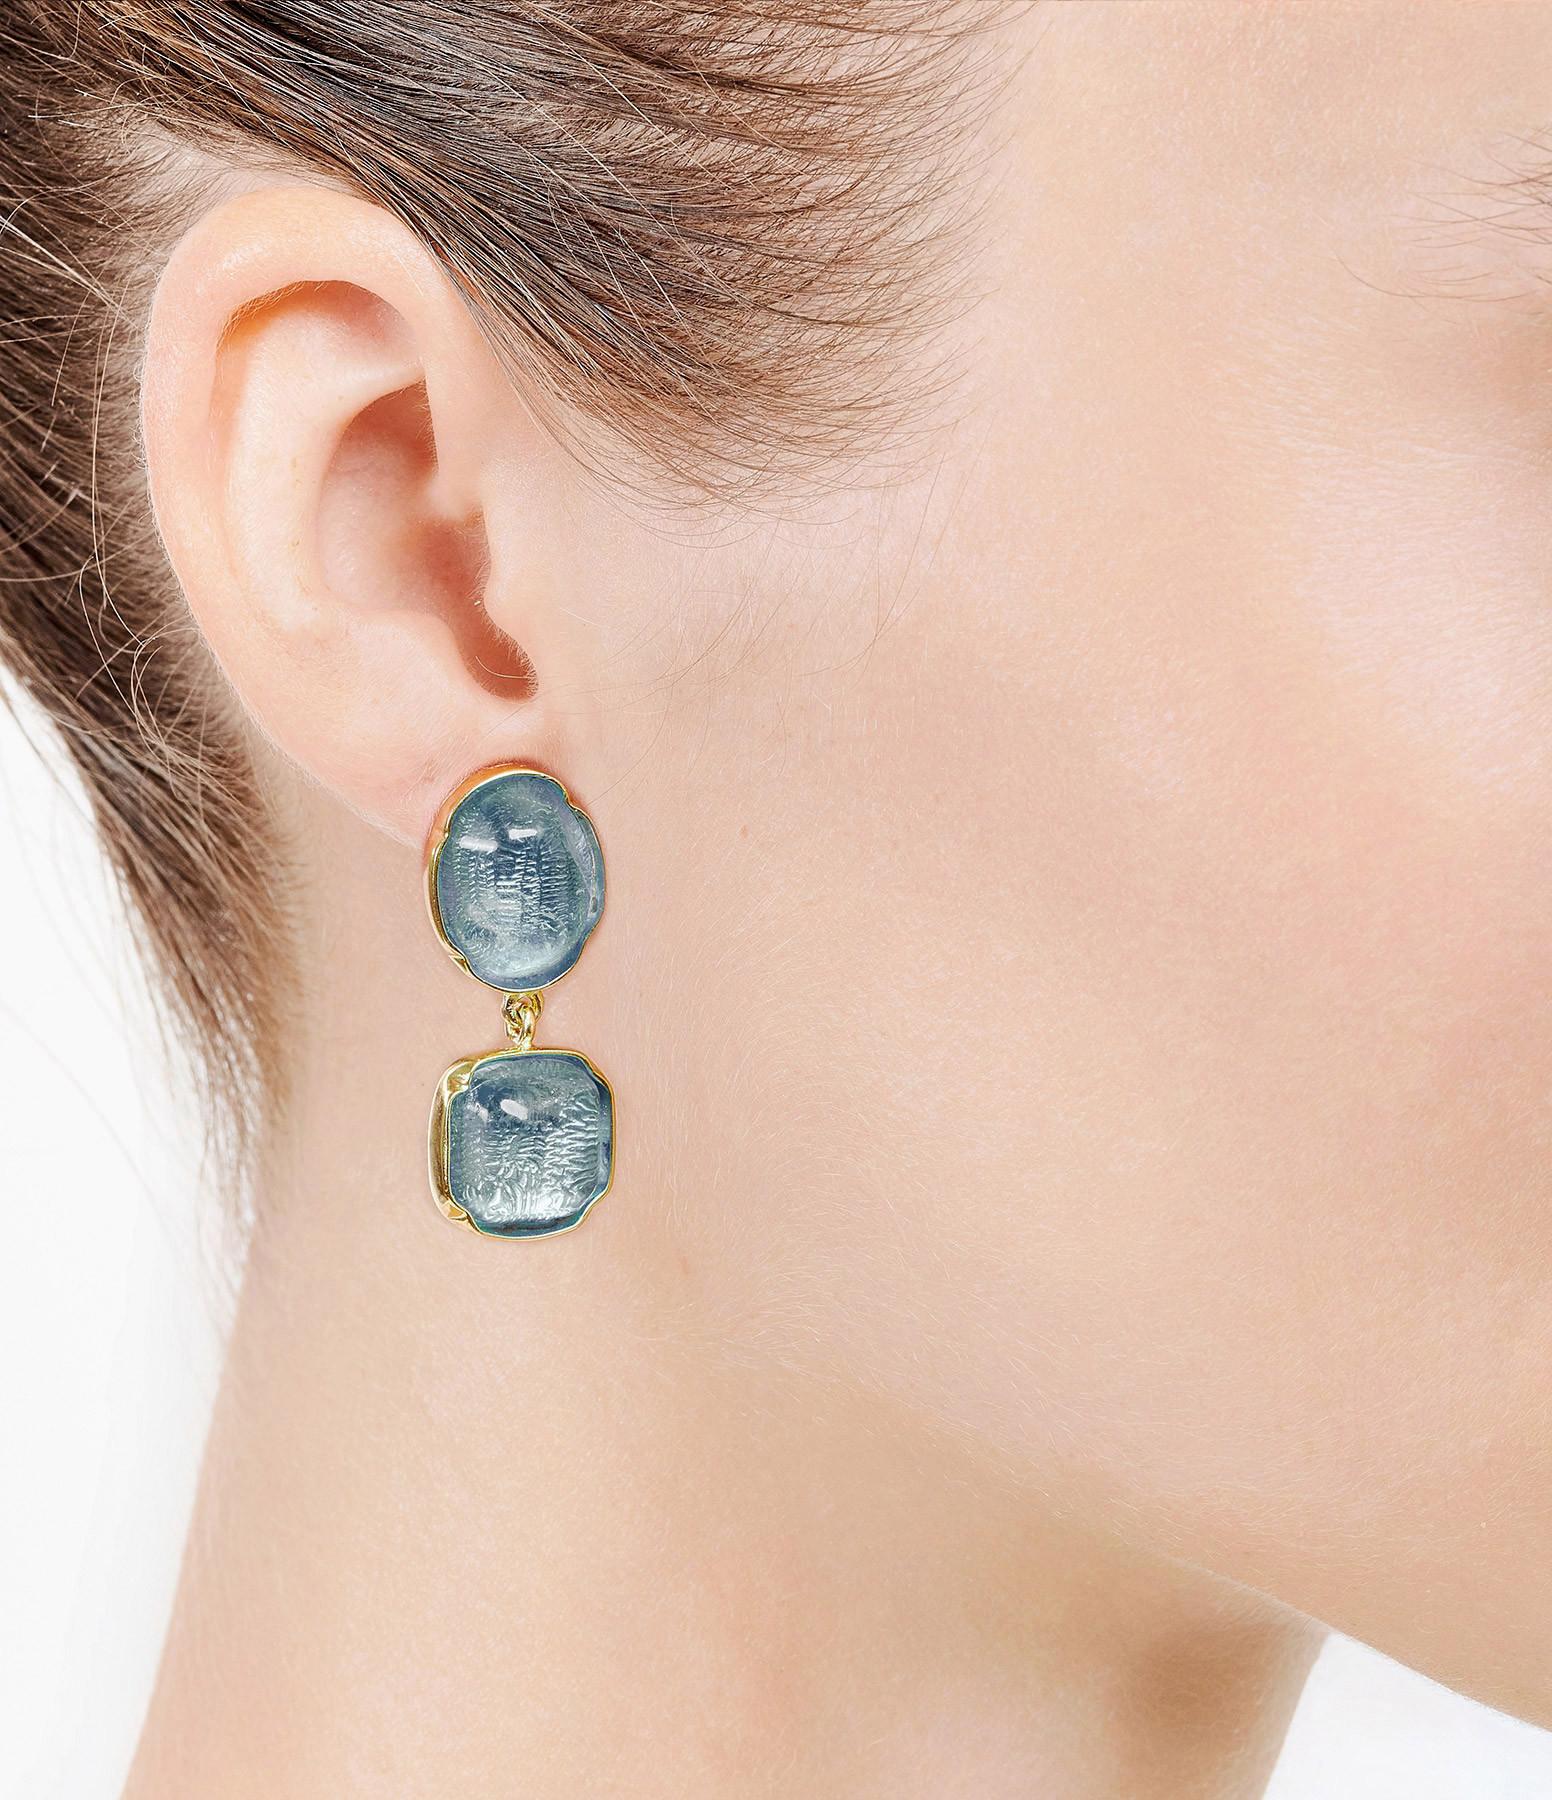 GOOSSENS - Boucles d'oreilles Cabochons Bleu Denim